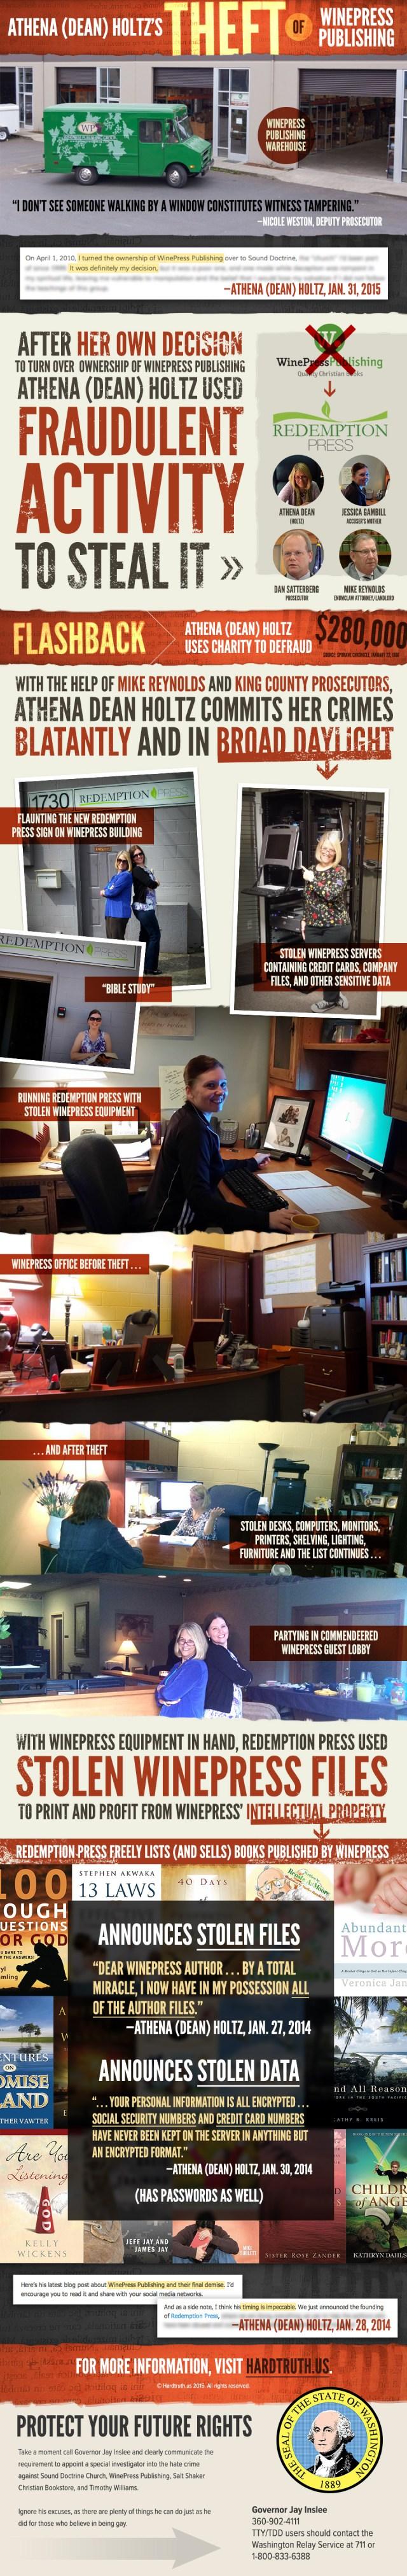 Nicole Weston King County Prosecutors Office